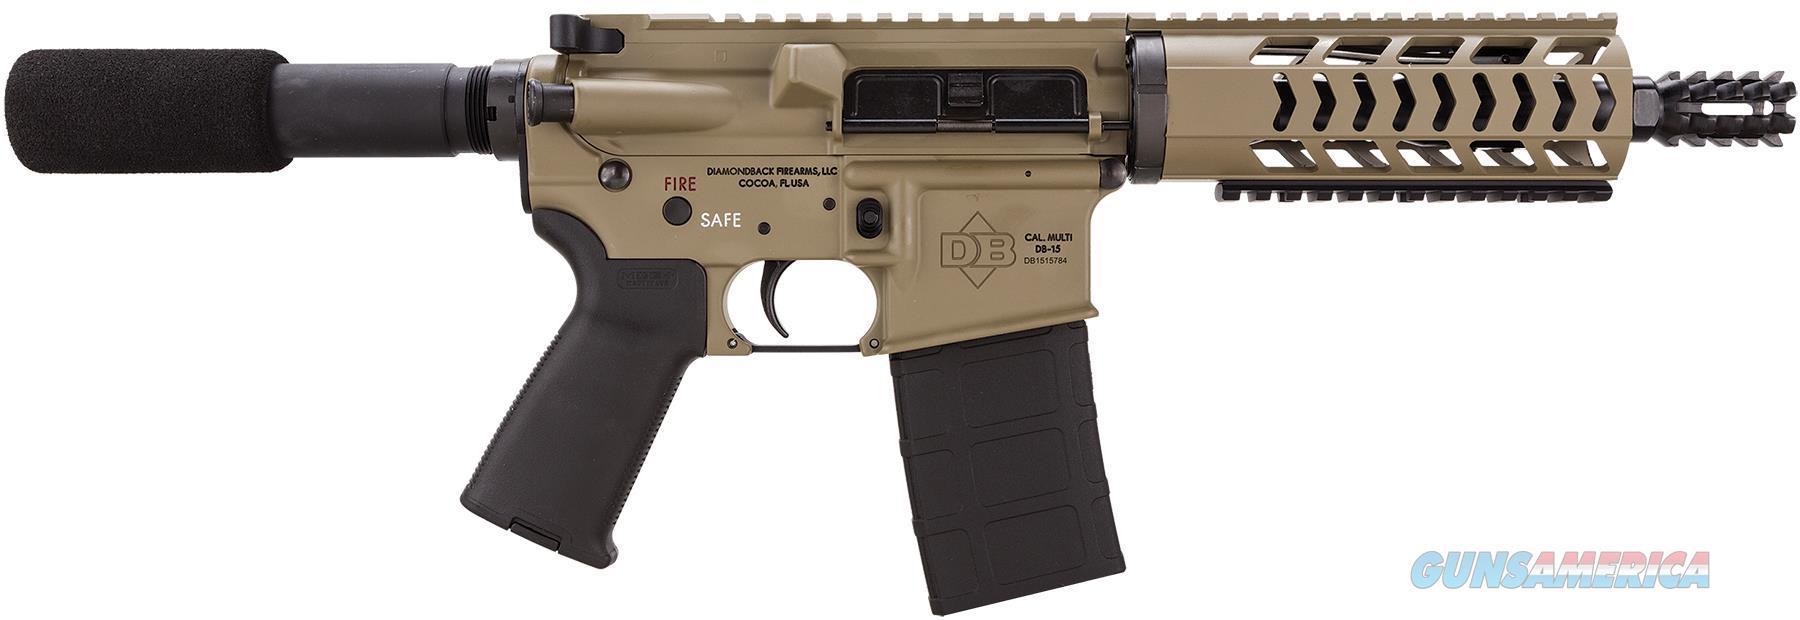 "Diamondback Db15pfde10 Db15 Ar Pistol Semi-Automatic 223 Remington/5.56 Nato 10.5"" 30+1  Flat Dark Earth Cerakote Receiver/Black Barrel 815875017288  Guns > Pistols > D Misc Pistols"